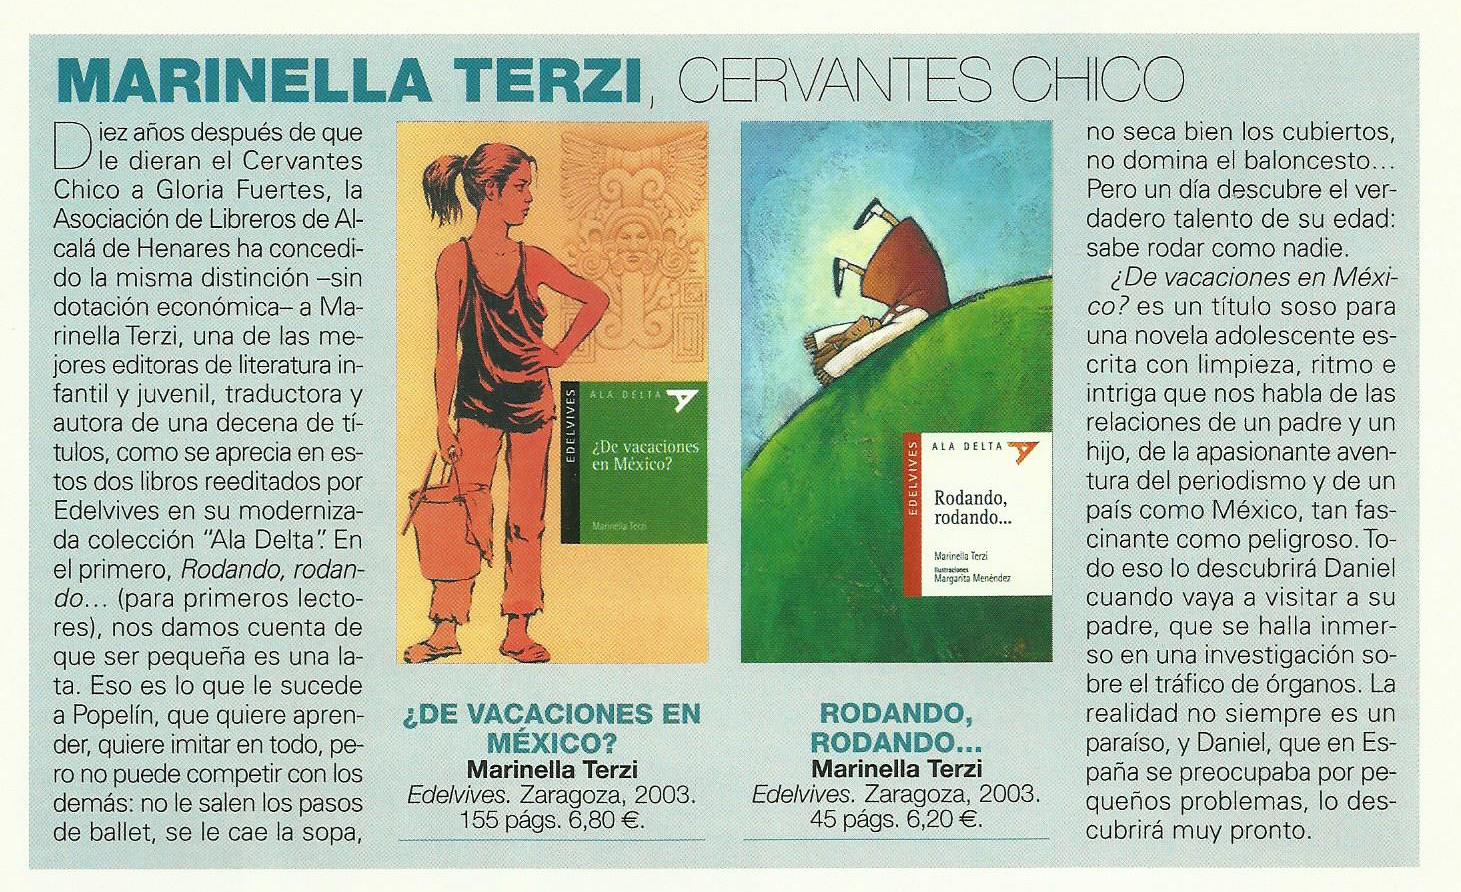 REVISTA-LEER-CERVANTES-CHICO Marinella Terzi